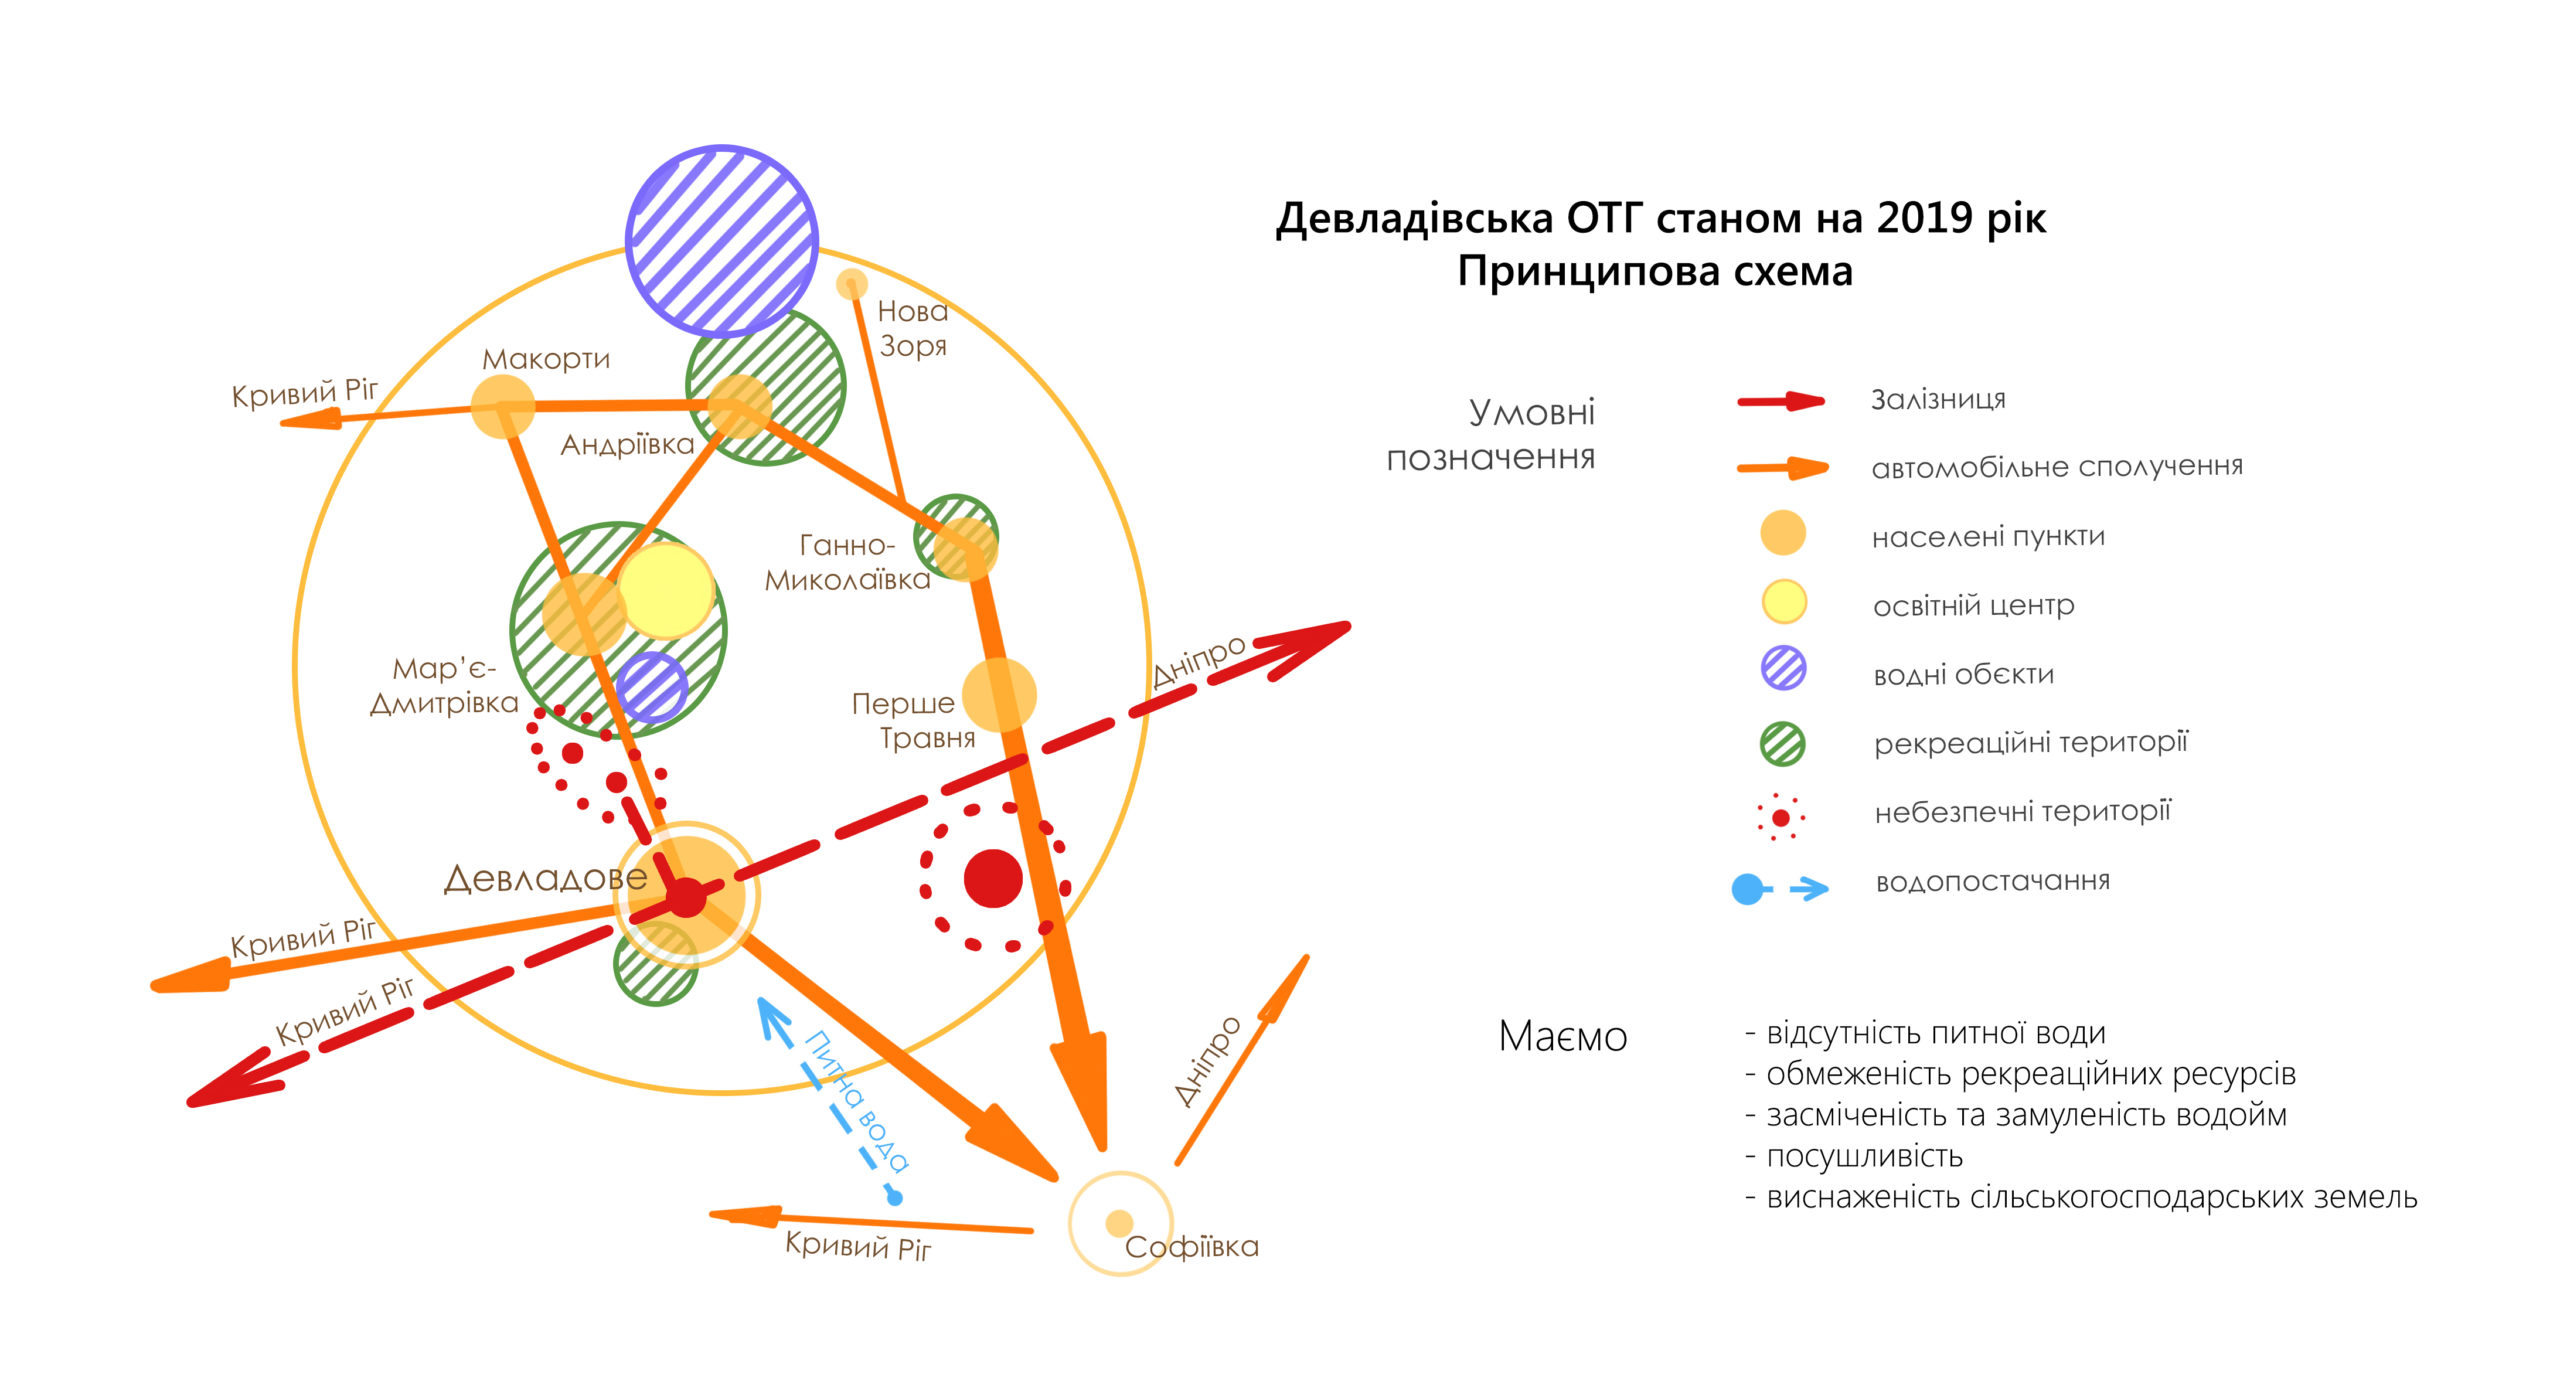 Devladivska AH схема 2019